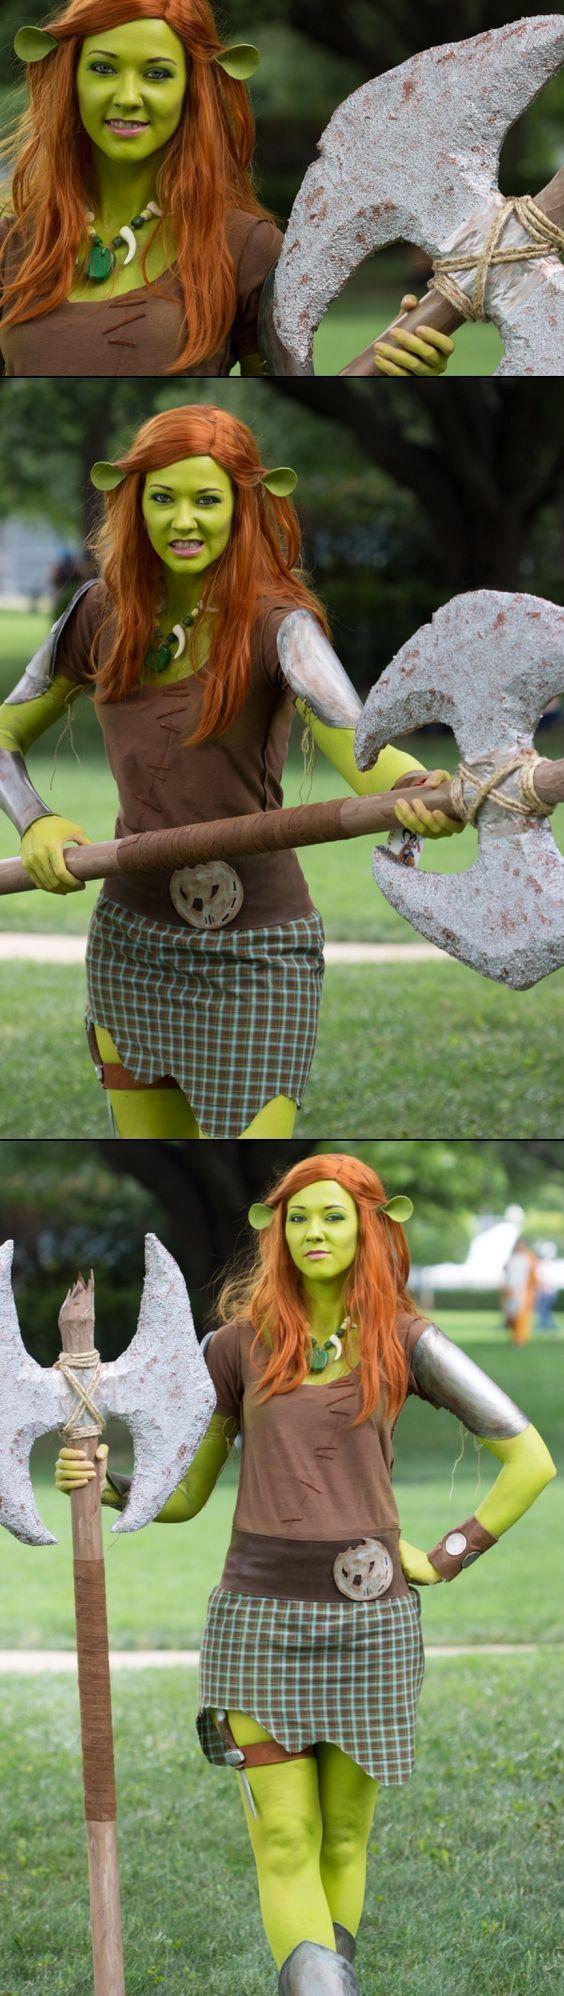 Shrek's Fiona Kostüm selber machen | maskerix.de